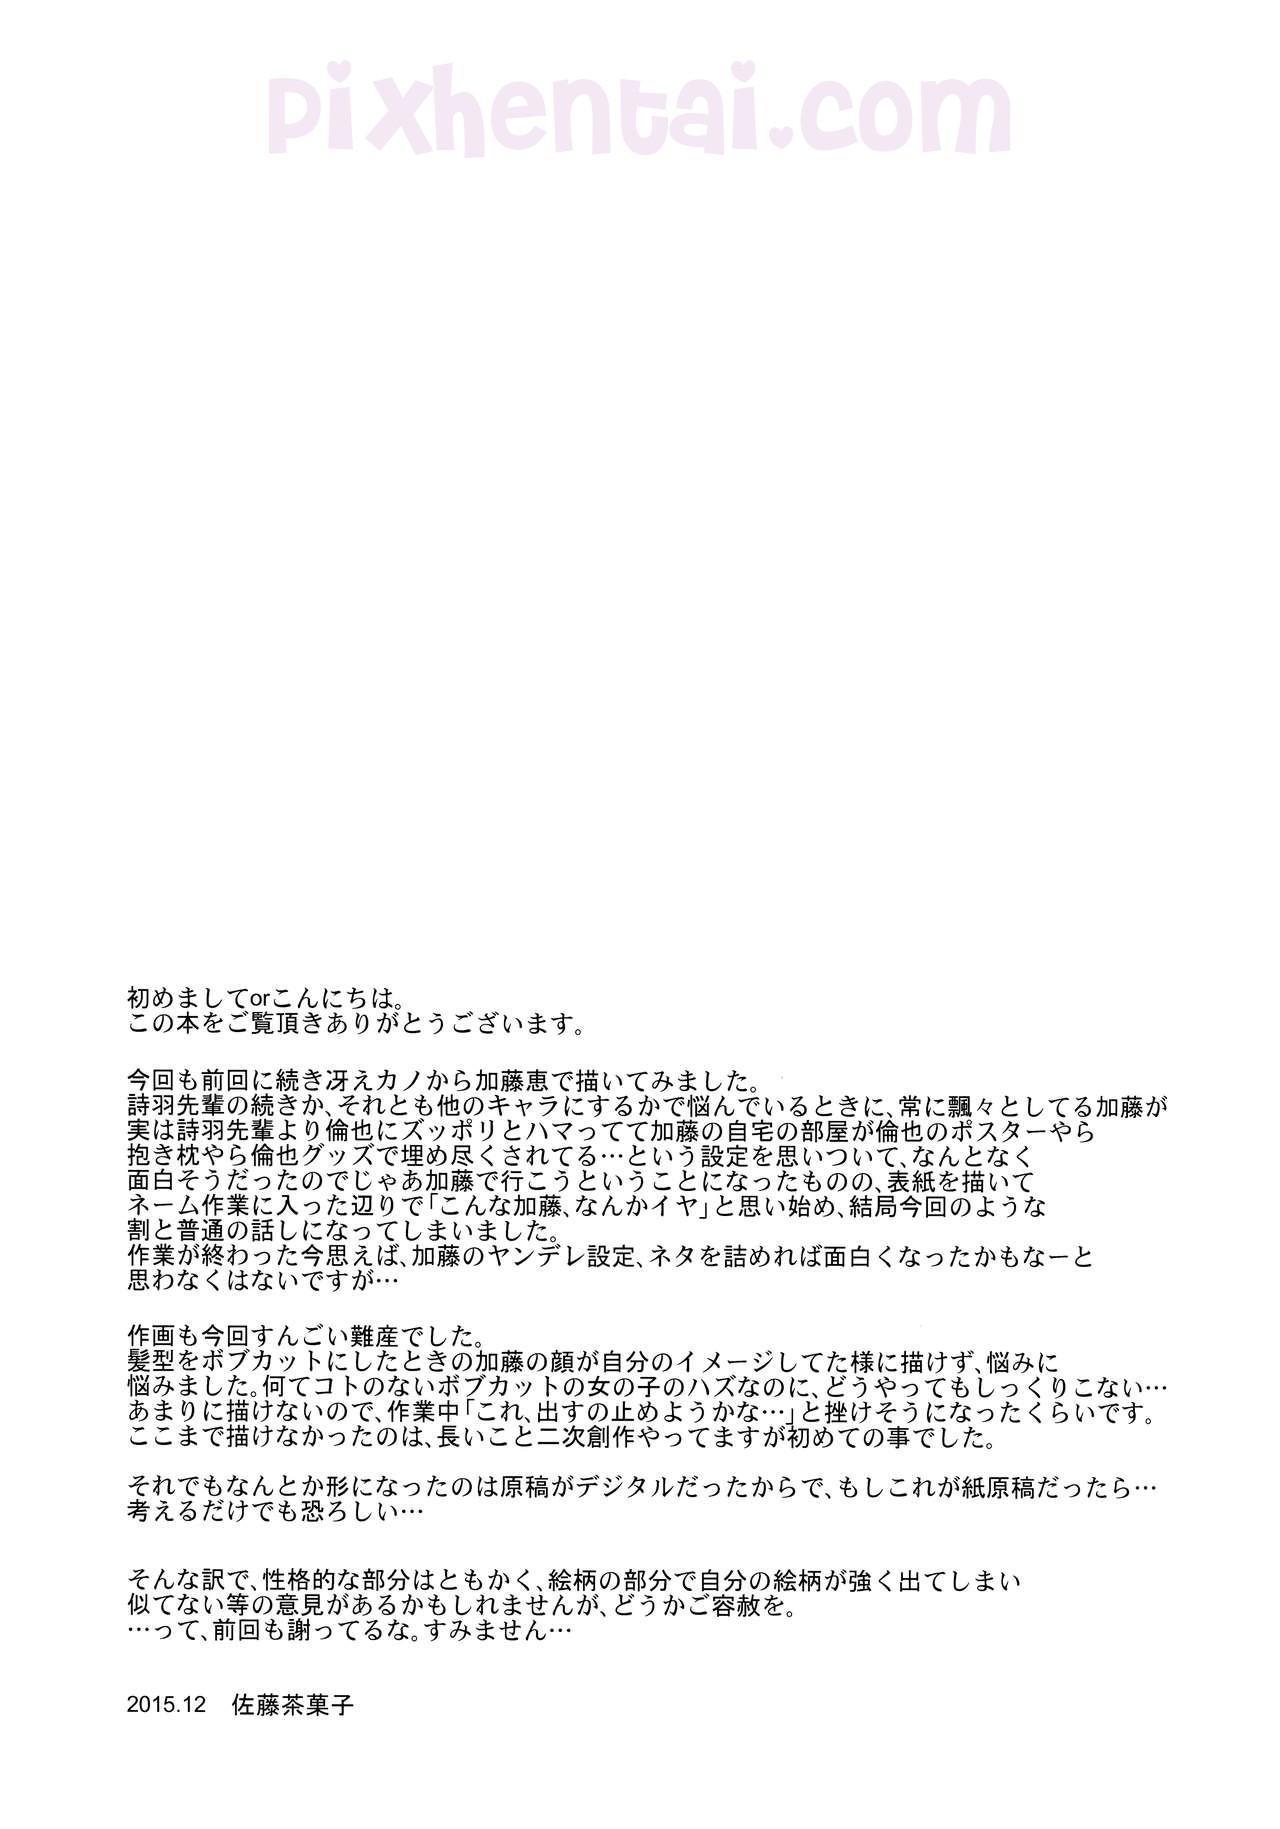 Komik Hentai Tergoda Gadis yang Tidur Bugil Manga XXX Porn Doujin Sex Bokep 24